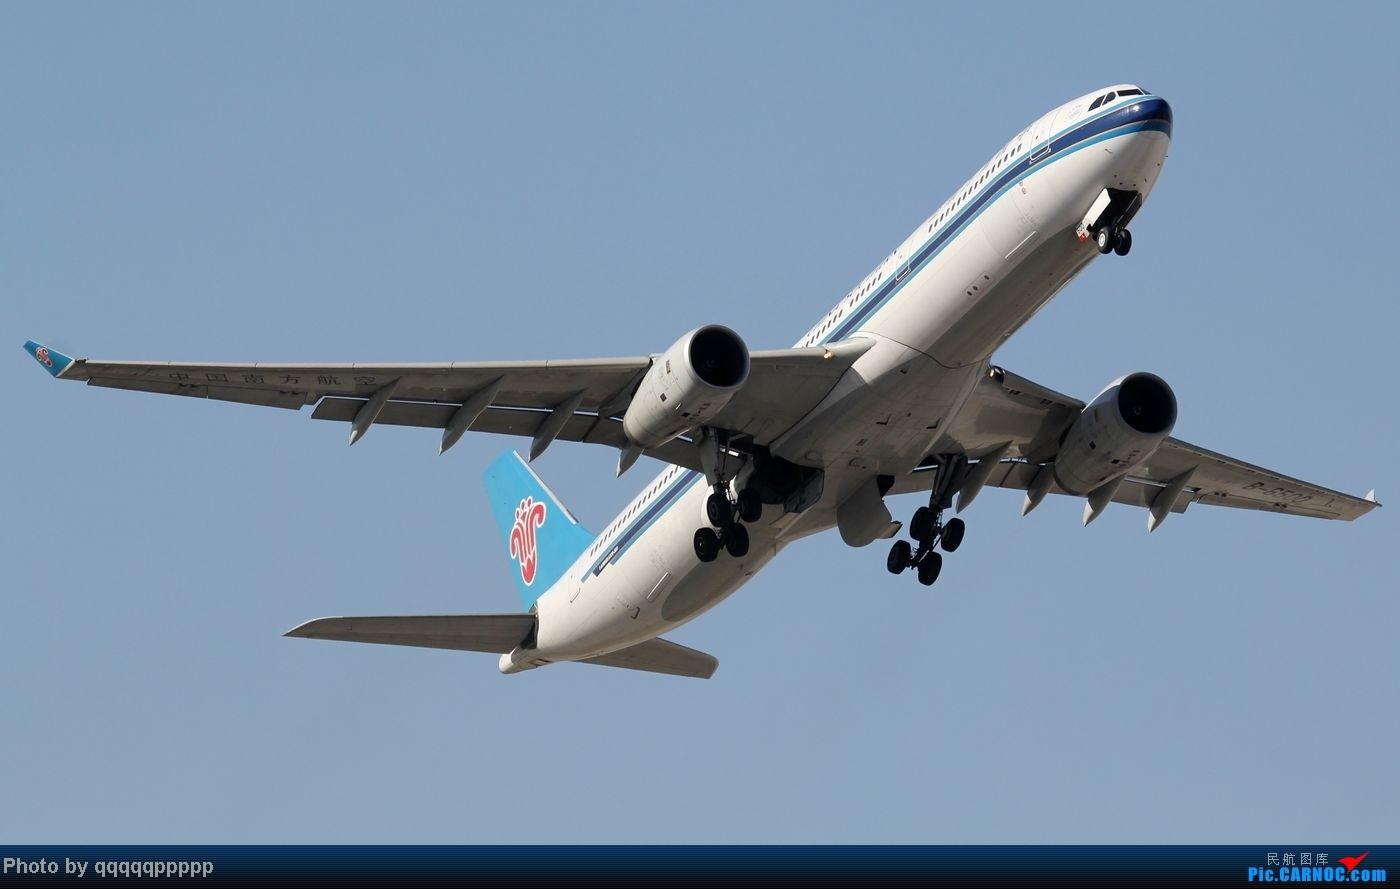 Re:[原创]五一小假期~北京迎来春暖花开的好天气。岂能错过这个拍机的好机会~ AIRBUS A330-300 B-6500 中国北京首都机场